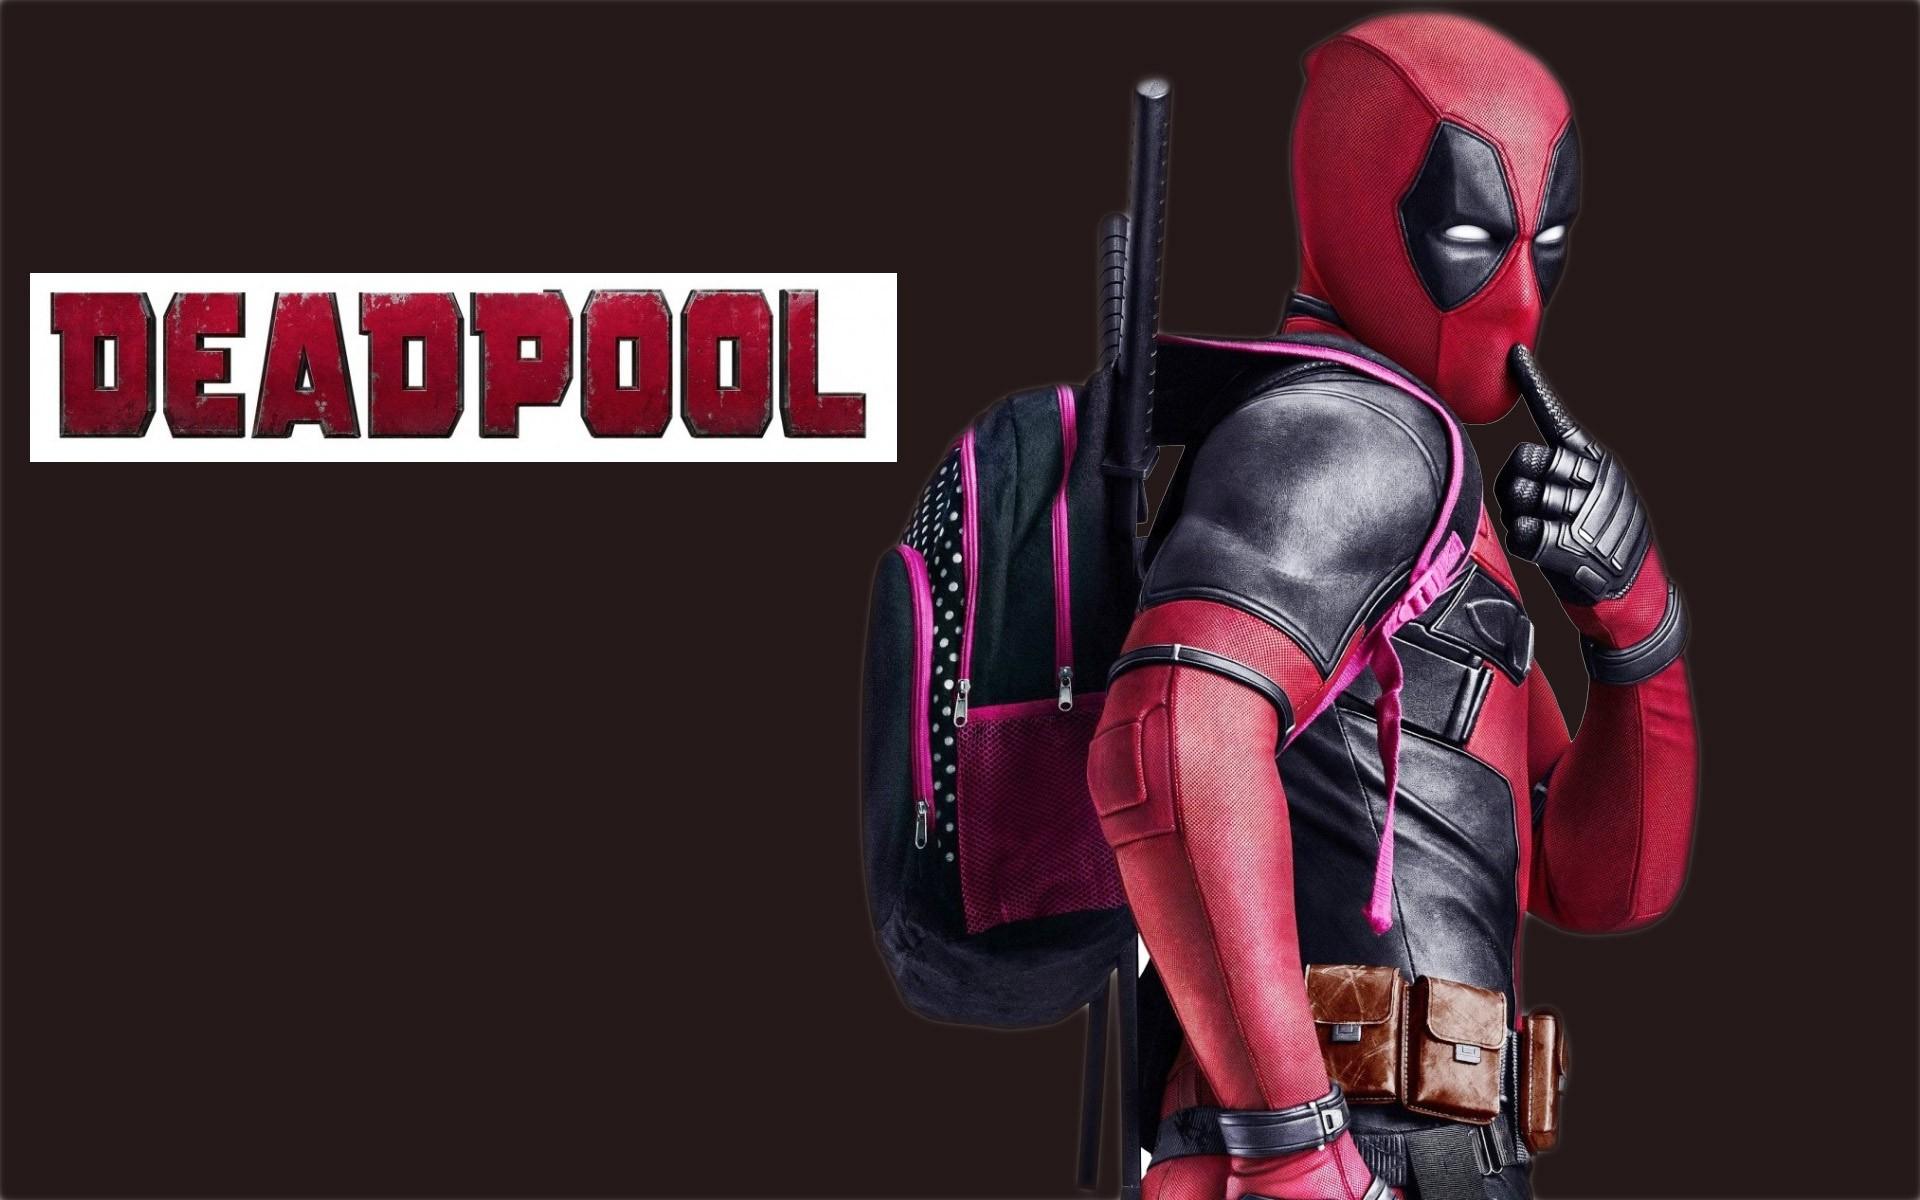 name deadpool movie 2016 hd wallpaper added 2016 01 19 tags jan 2016 1920x1200